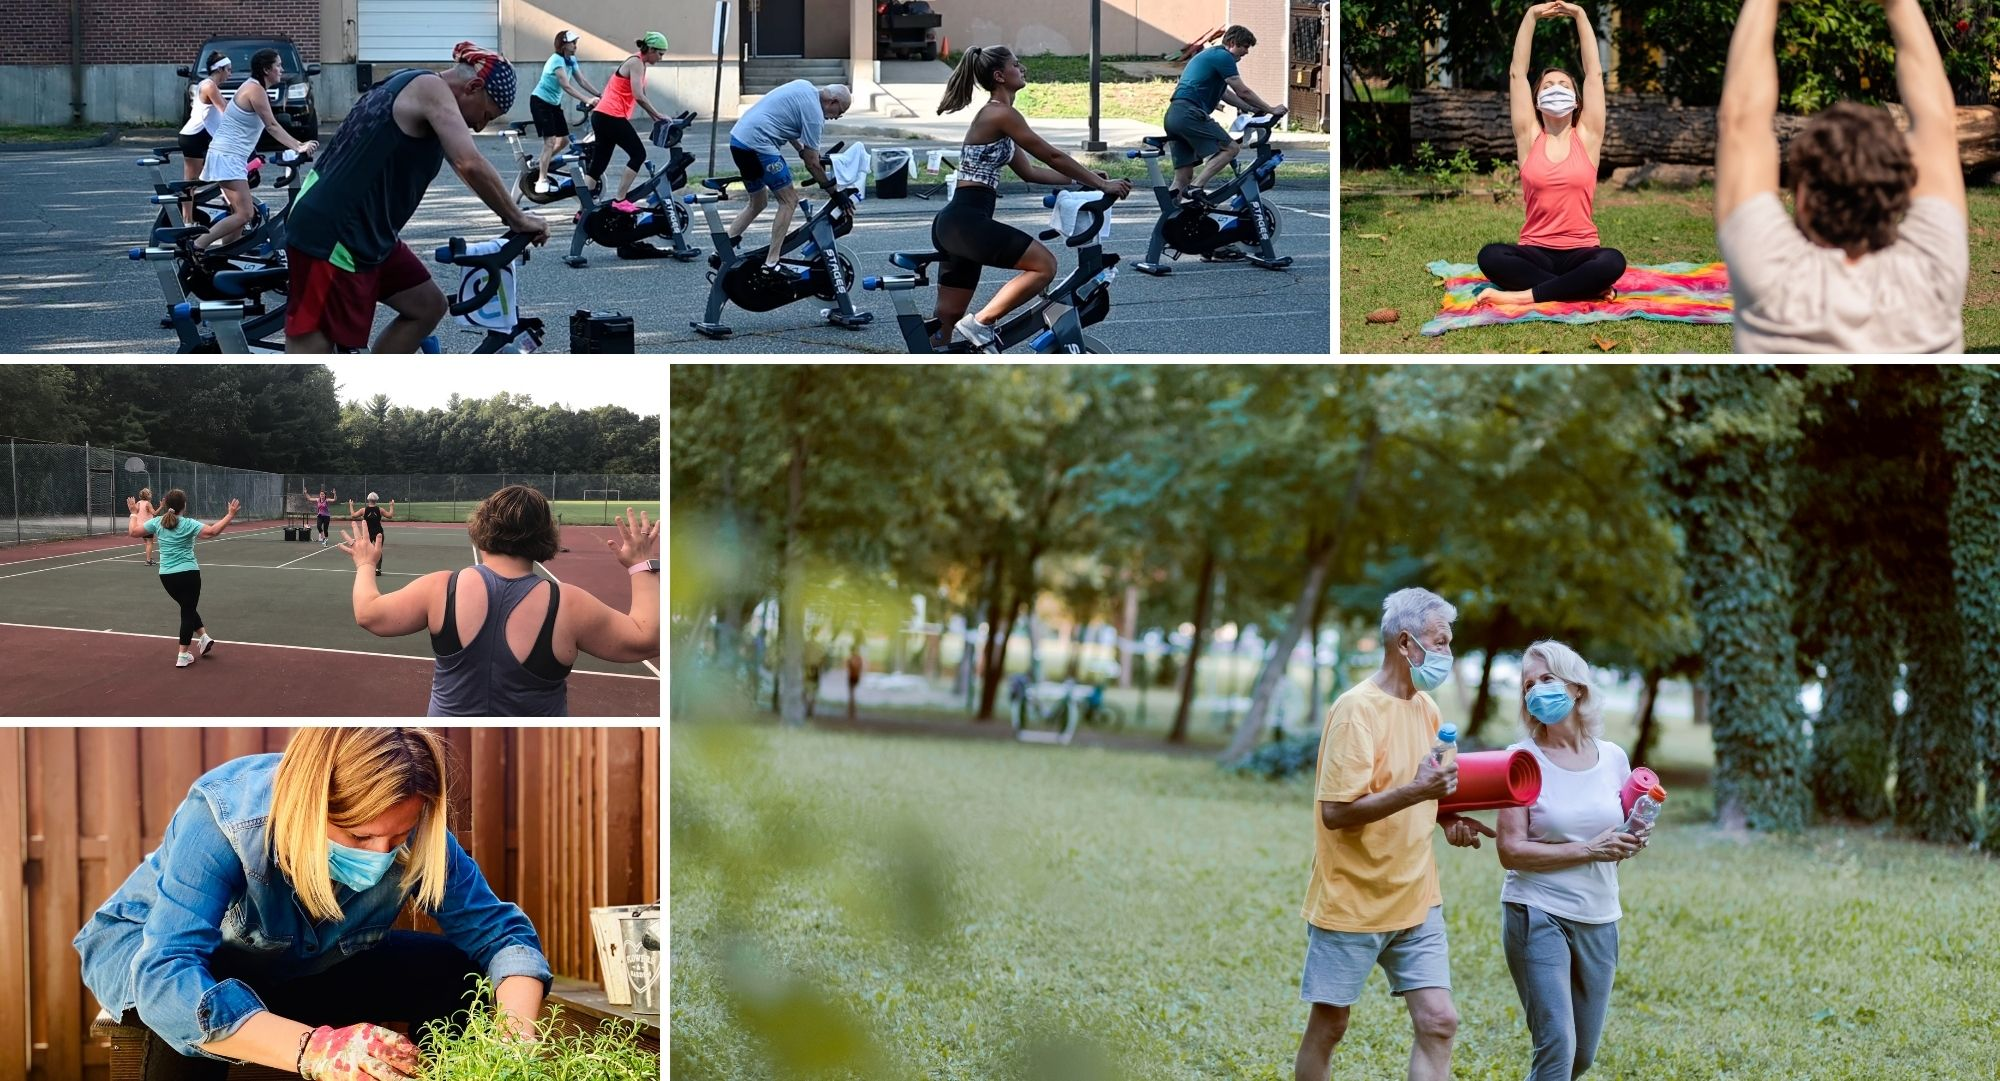 Outdoor Recreation & Fitness